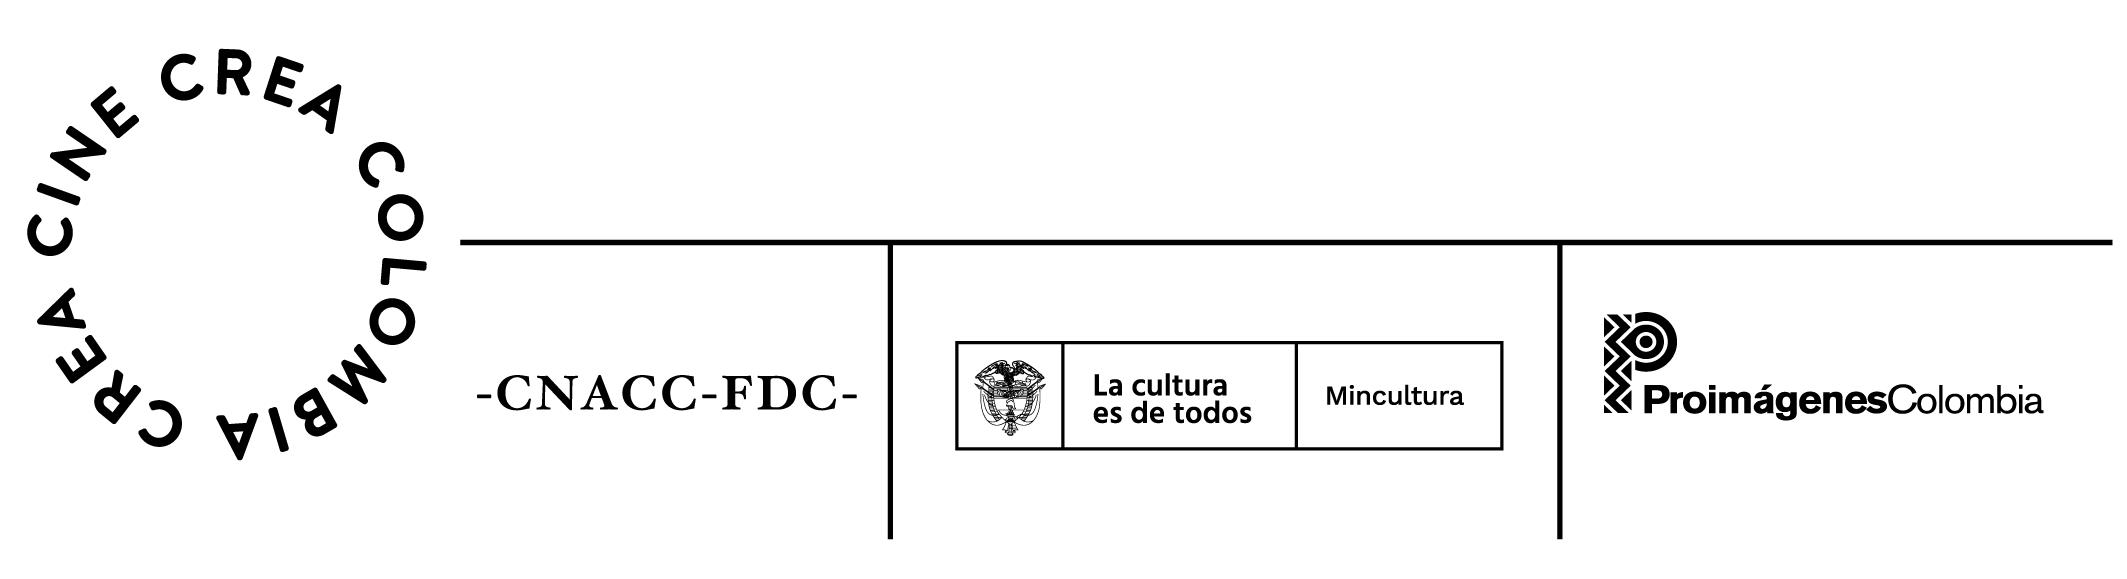 20210701 1632 fdc logo negro